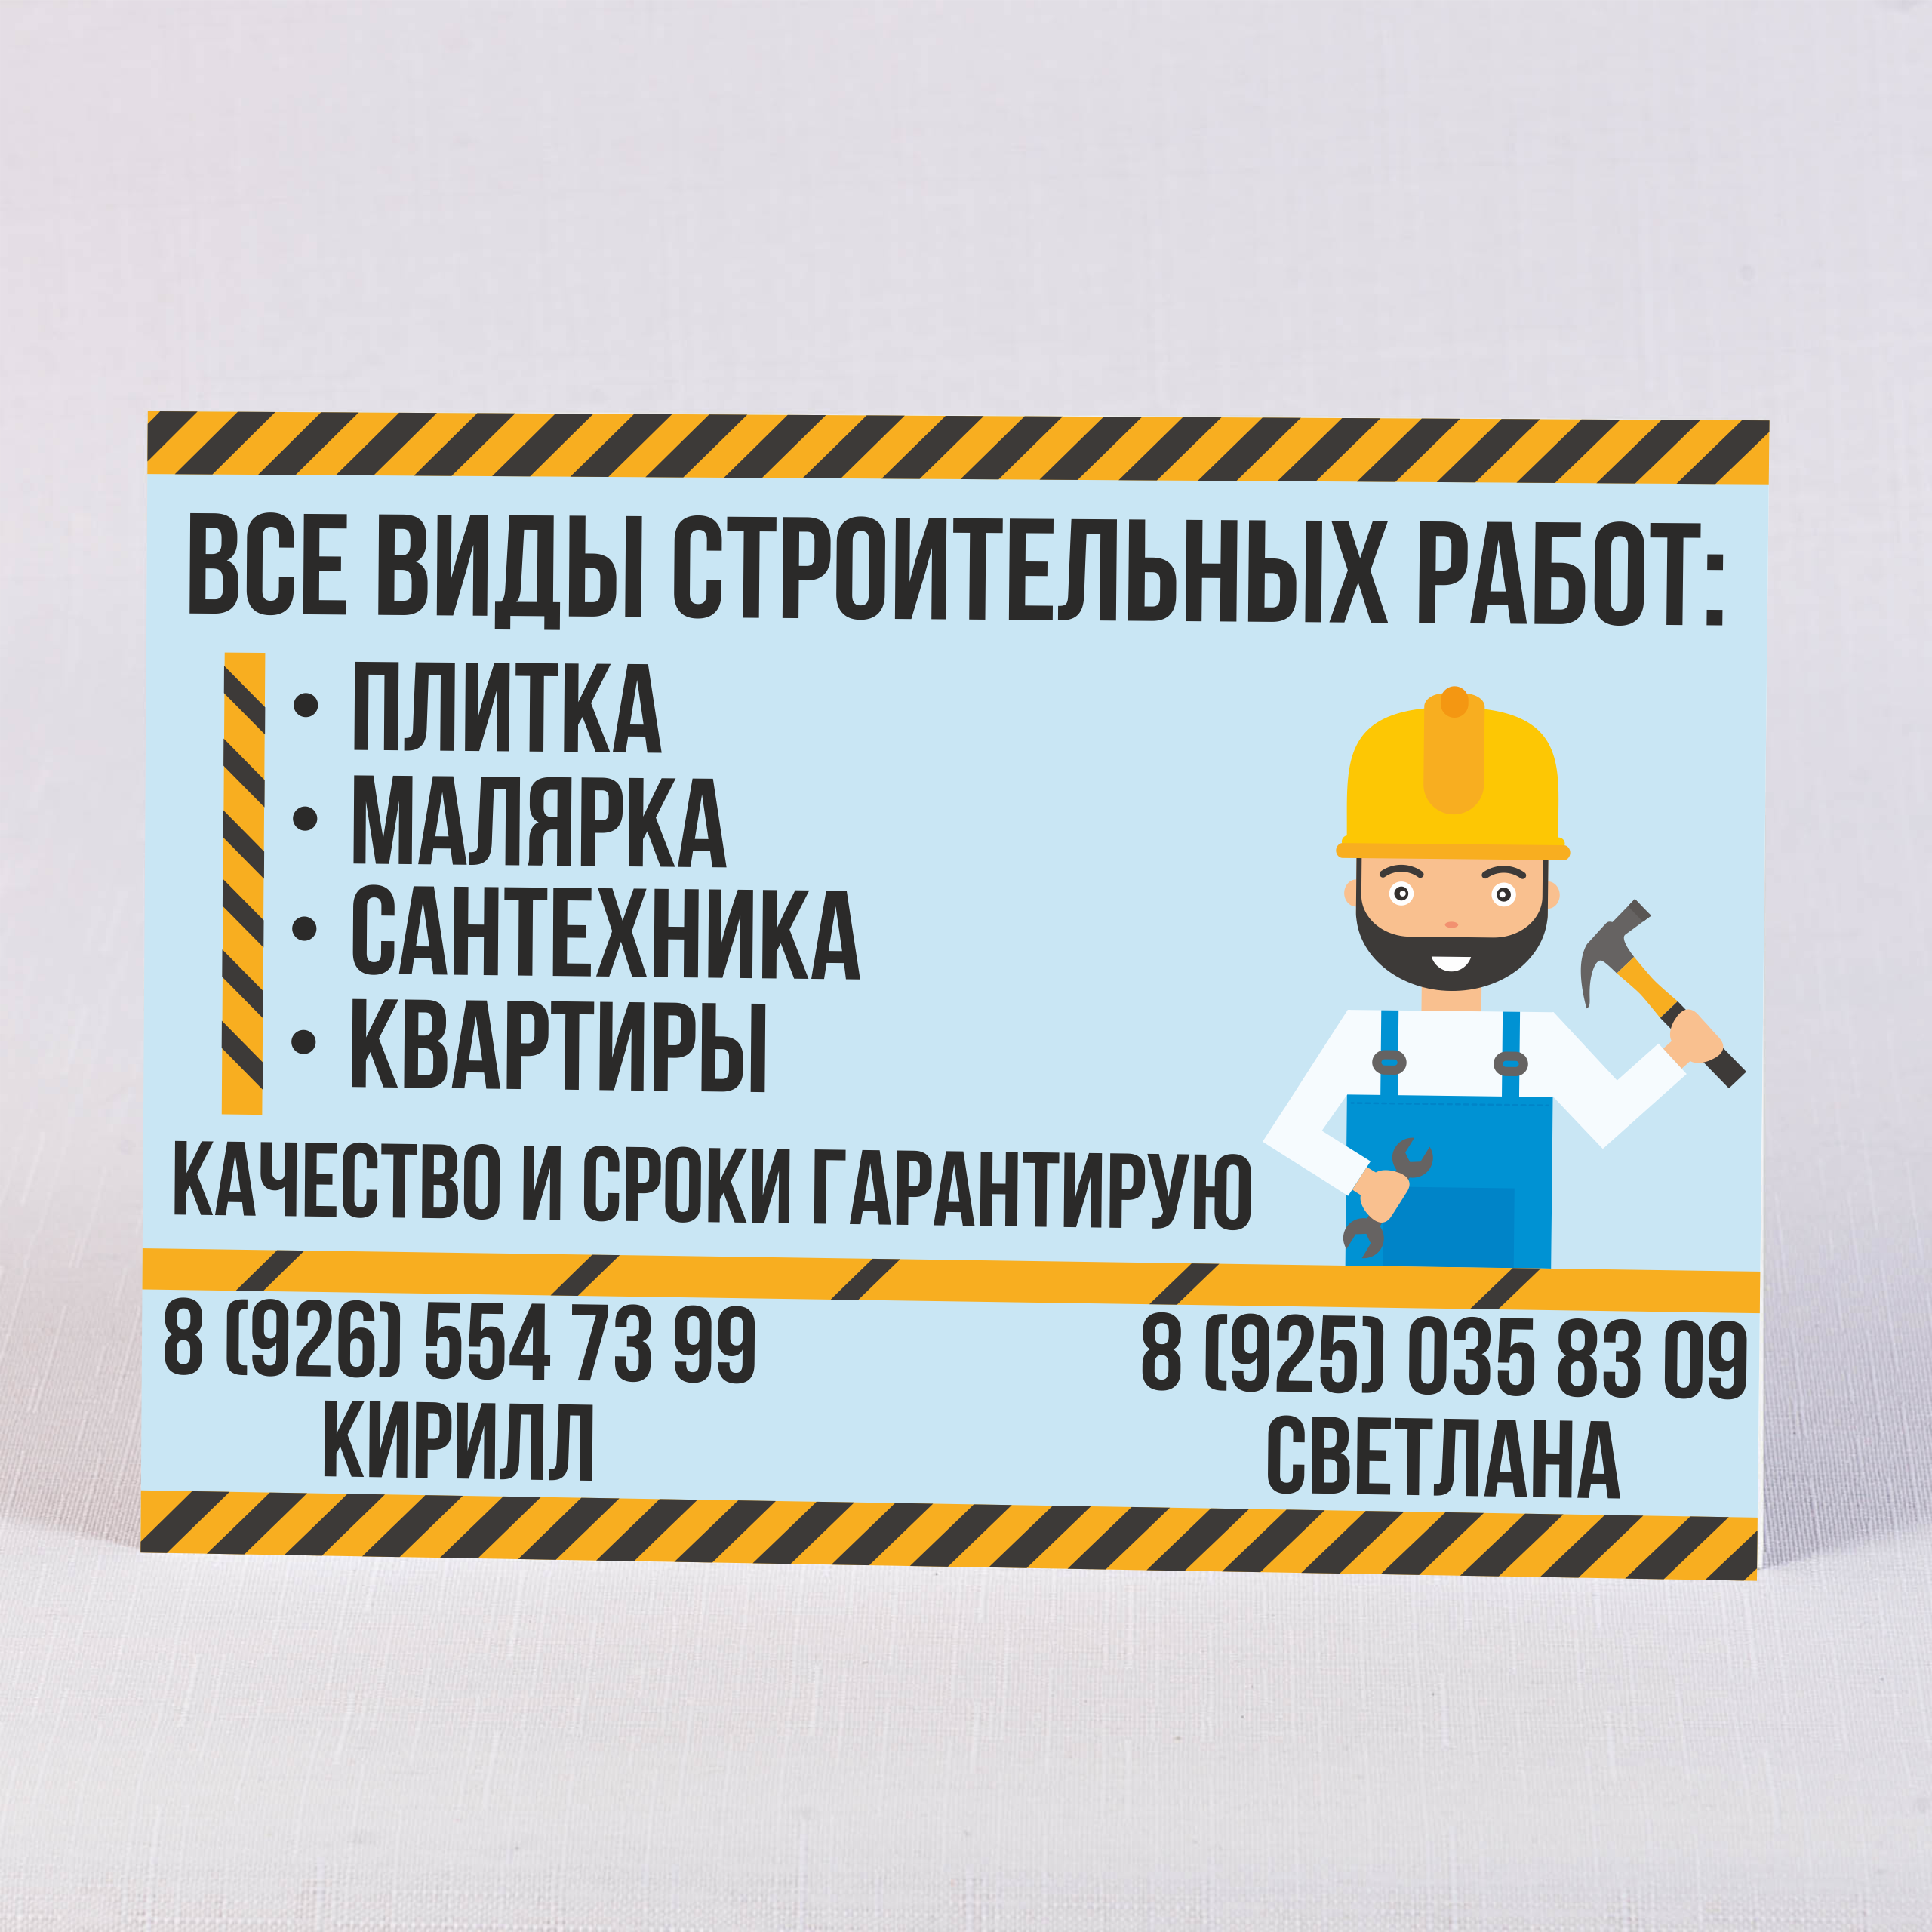 http://images.vfl.ru/ii/1517682582/f7813e2c/20434196.png